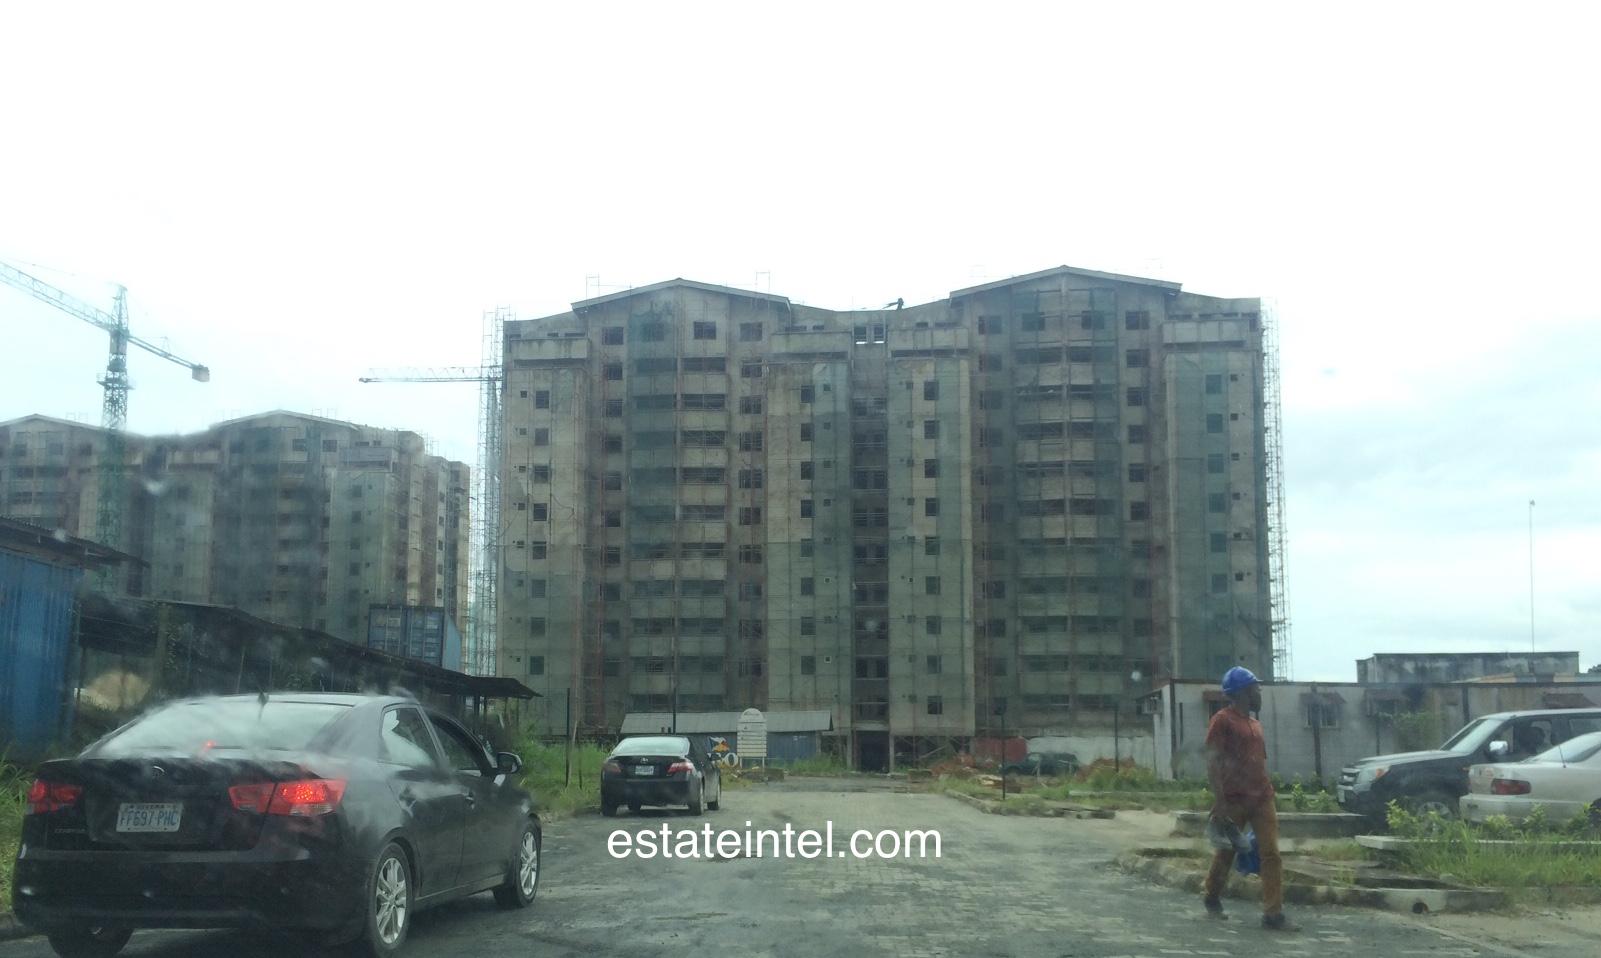 City Block Towers - Rainbow Town, Port Harcourt. Image Source: estateintel.com